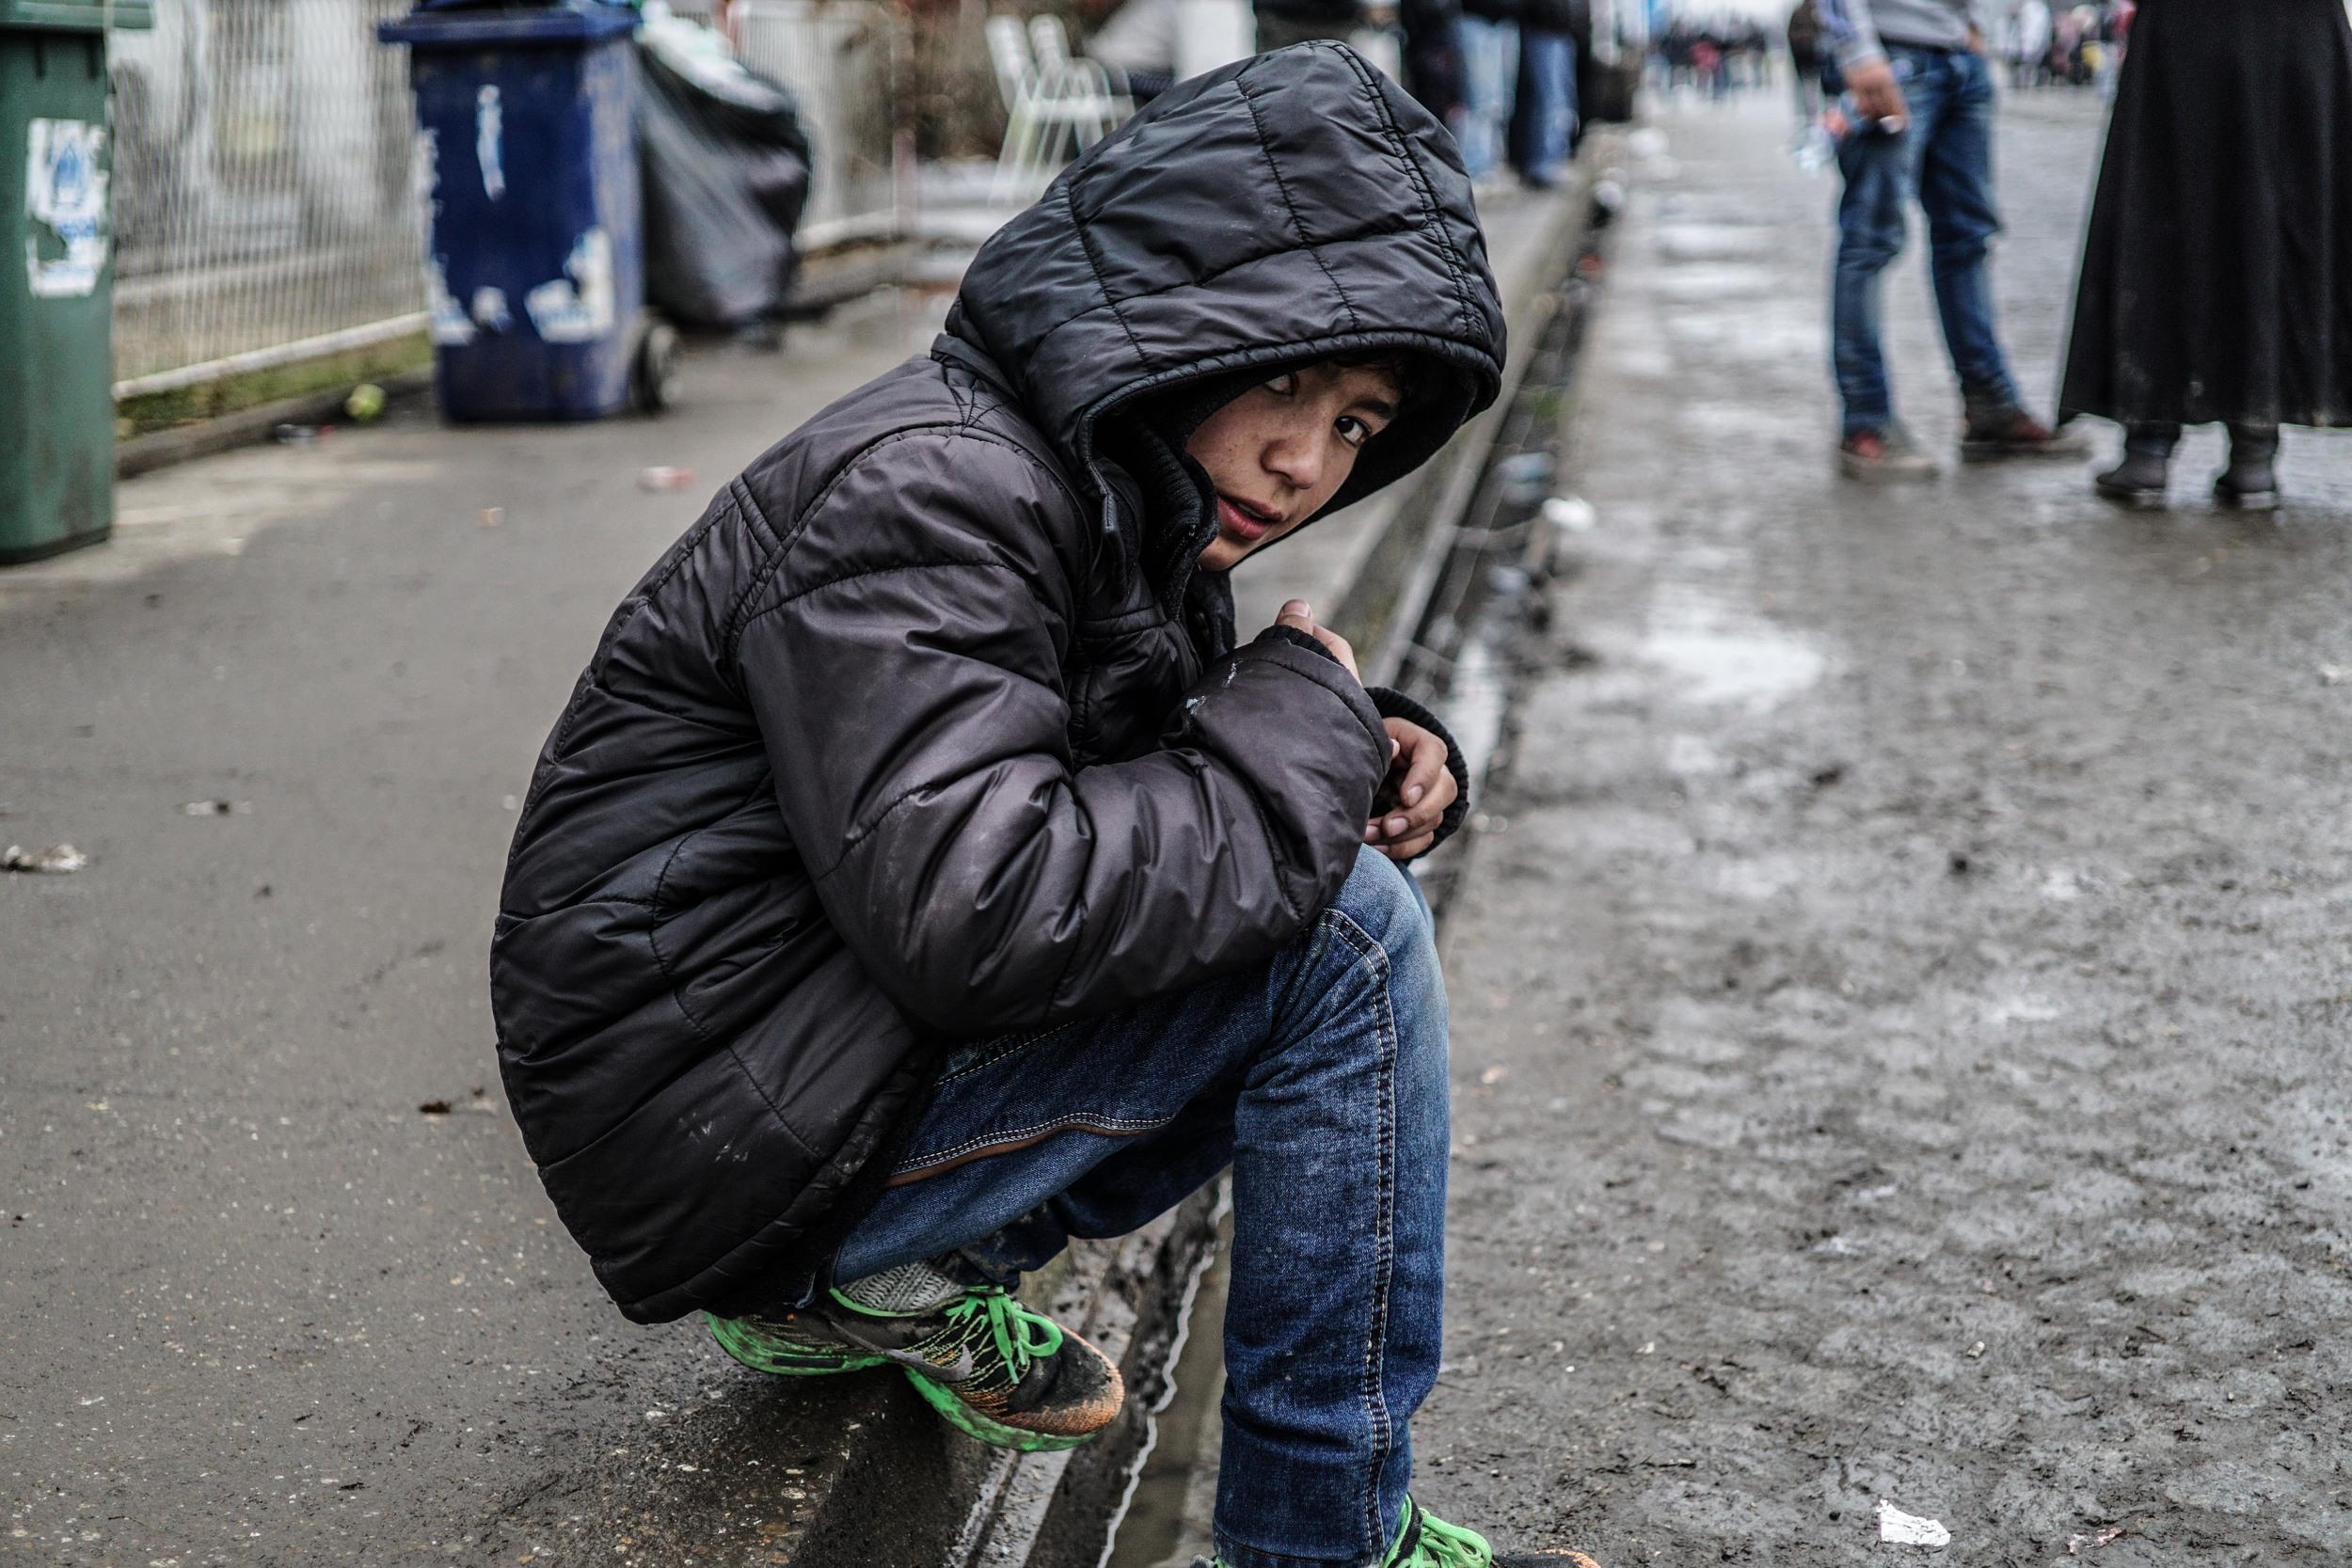 Syrian Refugee Crisis Serbia November 2015 9.jpg